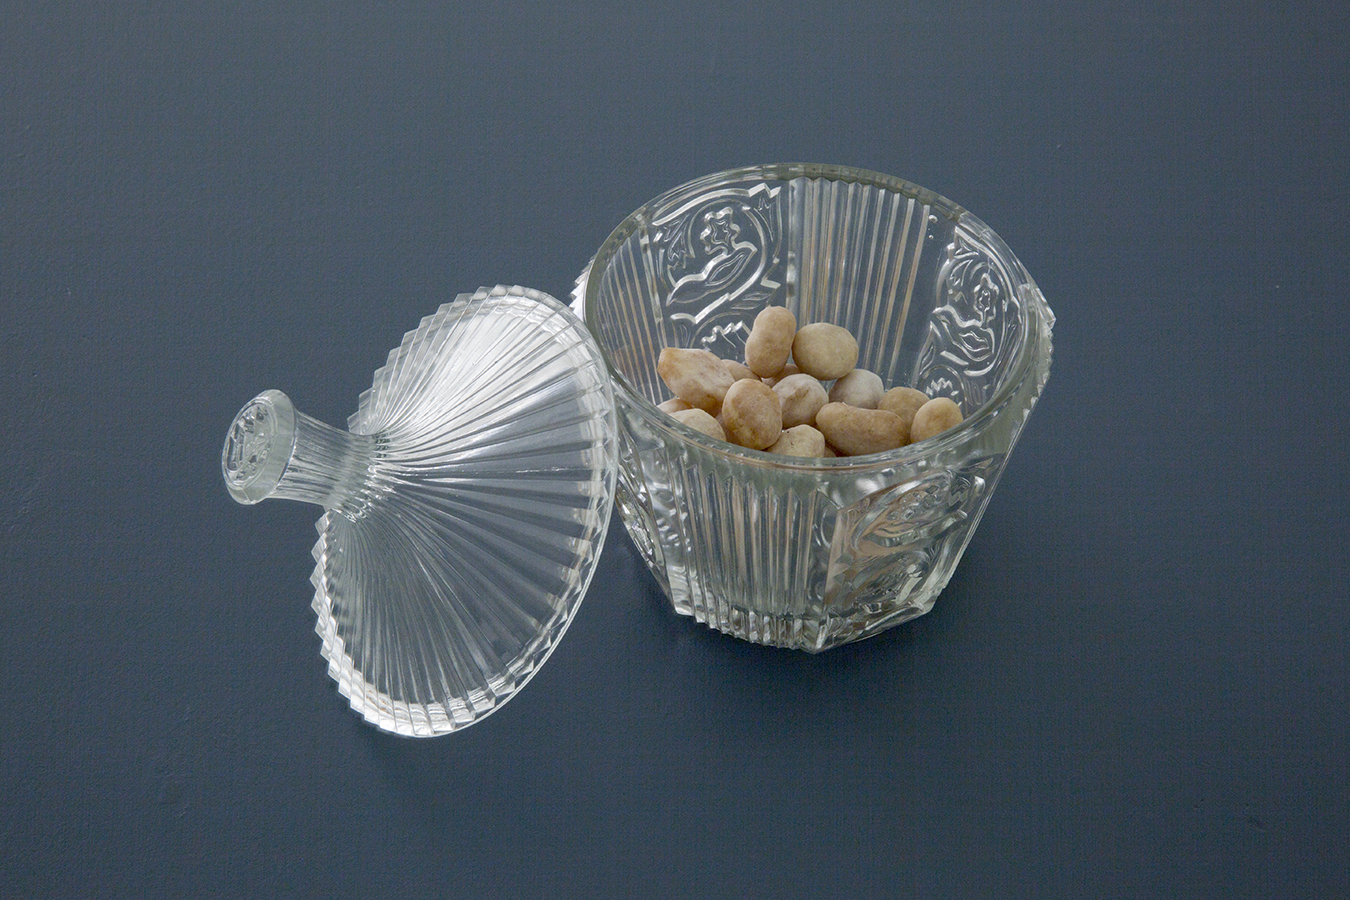 Marwan Moujaes, I brought you candies, photos Mathieu Harel Vivier5.jpg